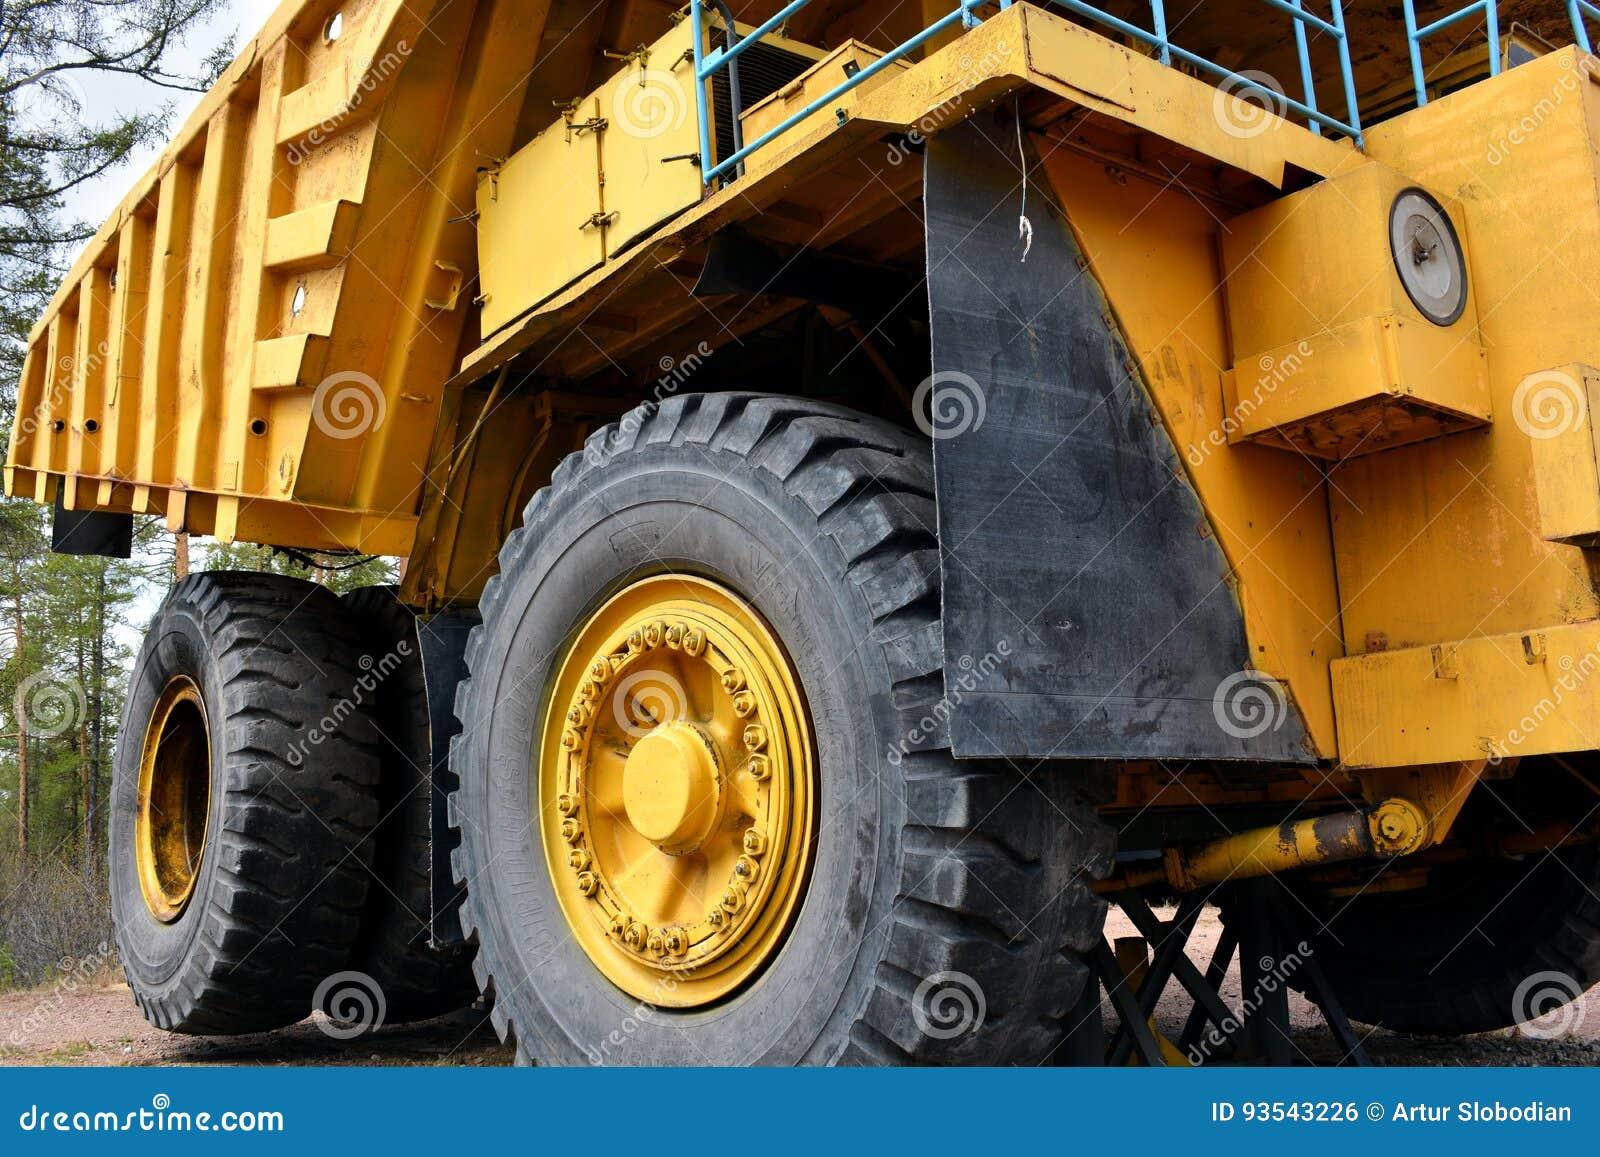 Dump front mining quarry side truck